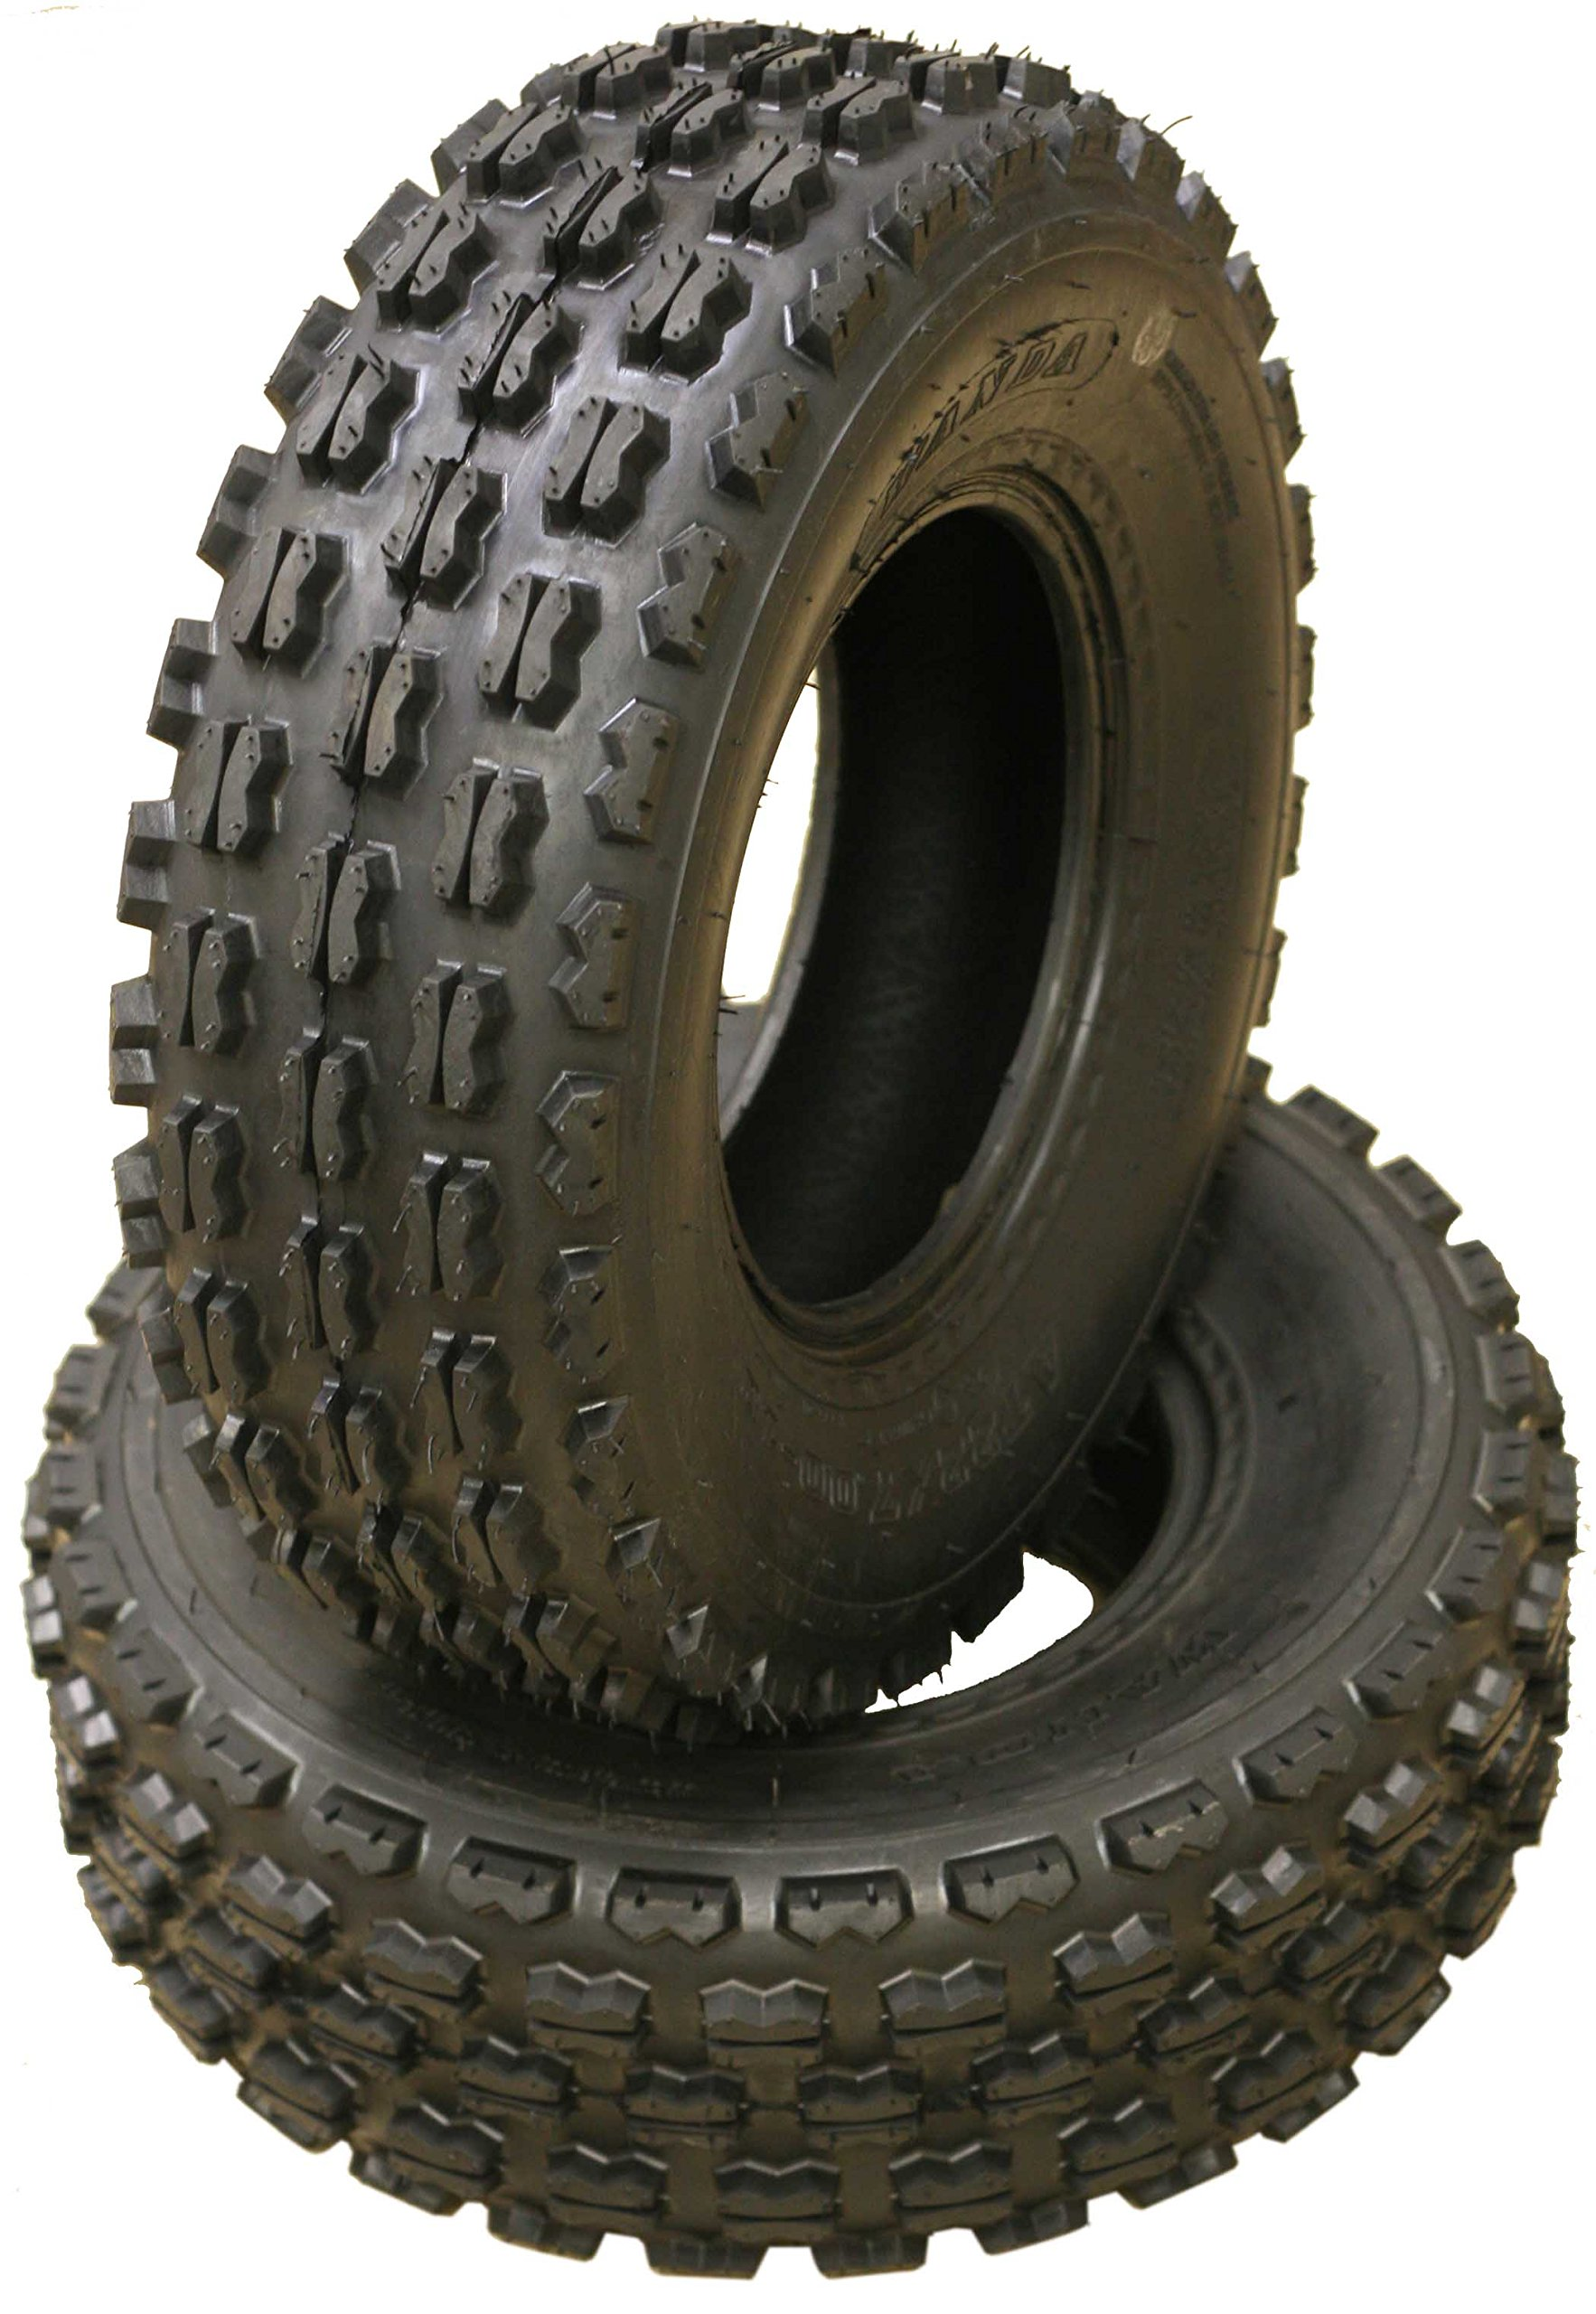 Set of 4 New Sport ATV Tires 22x7-10 Front & 22x10-10 Rear /4PR - 10077/10089 by Wanda (Image #2)